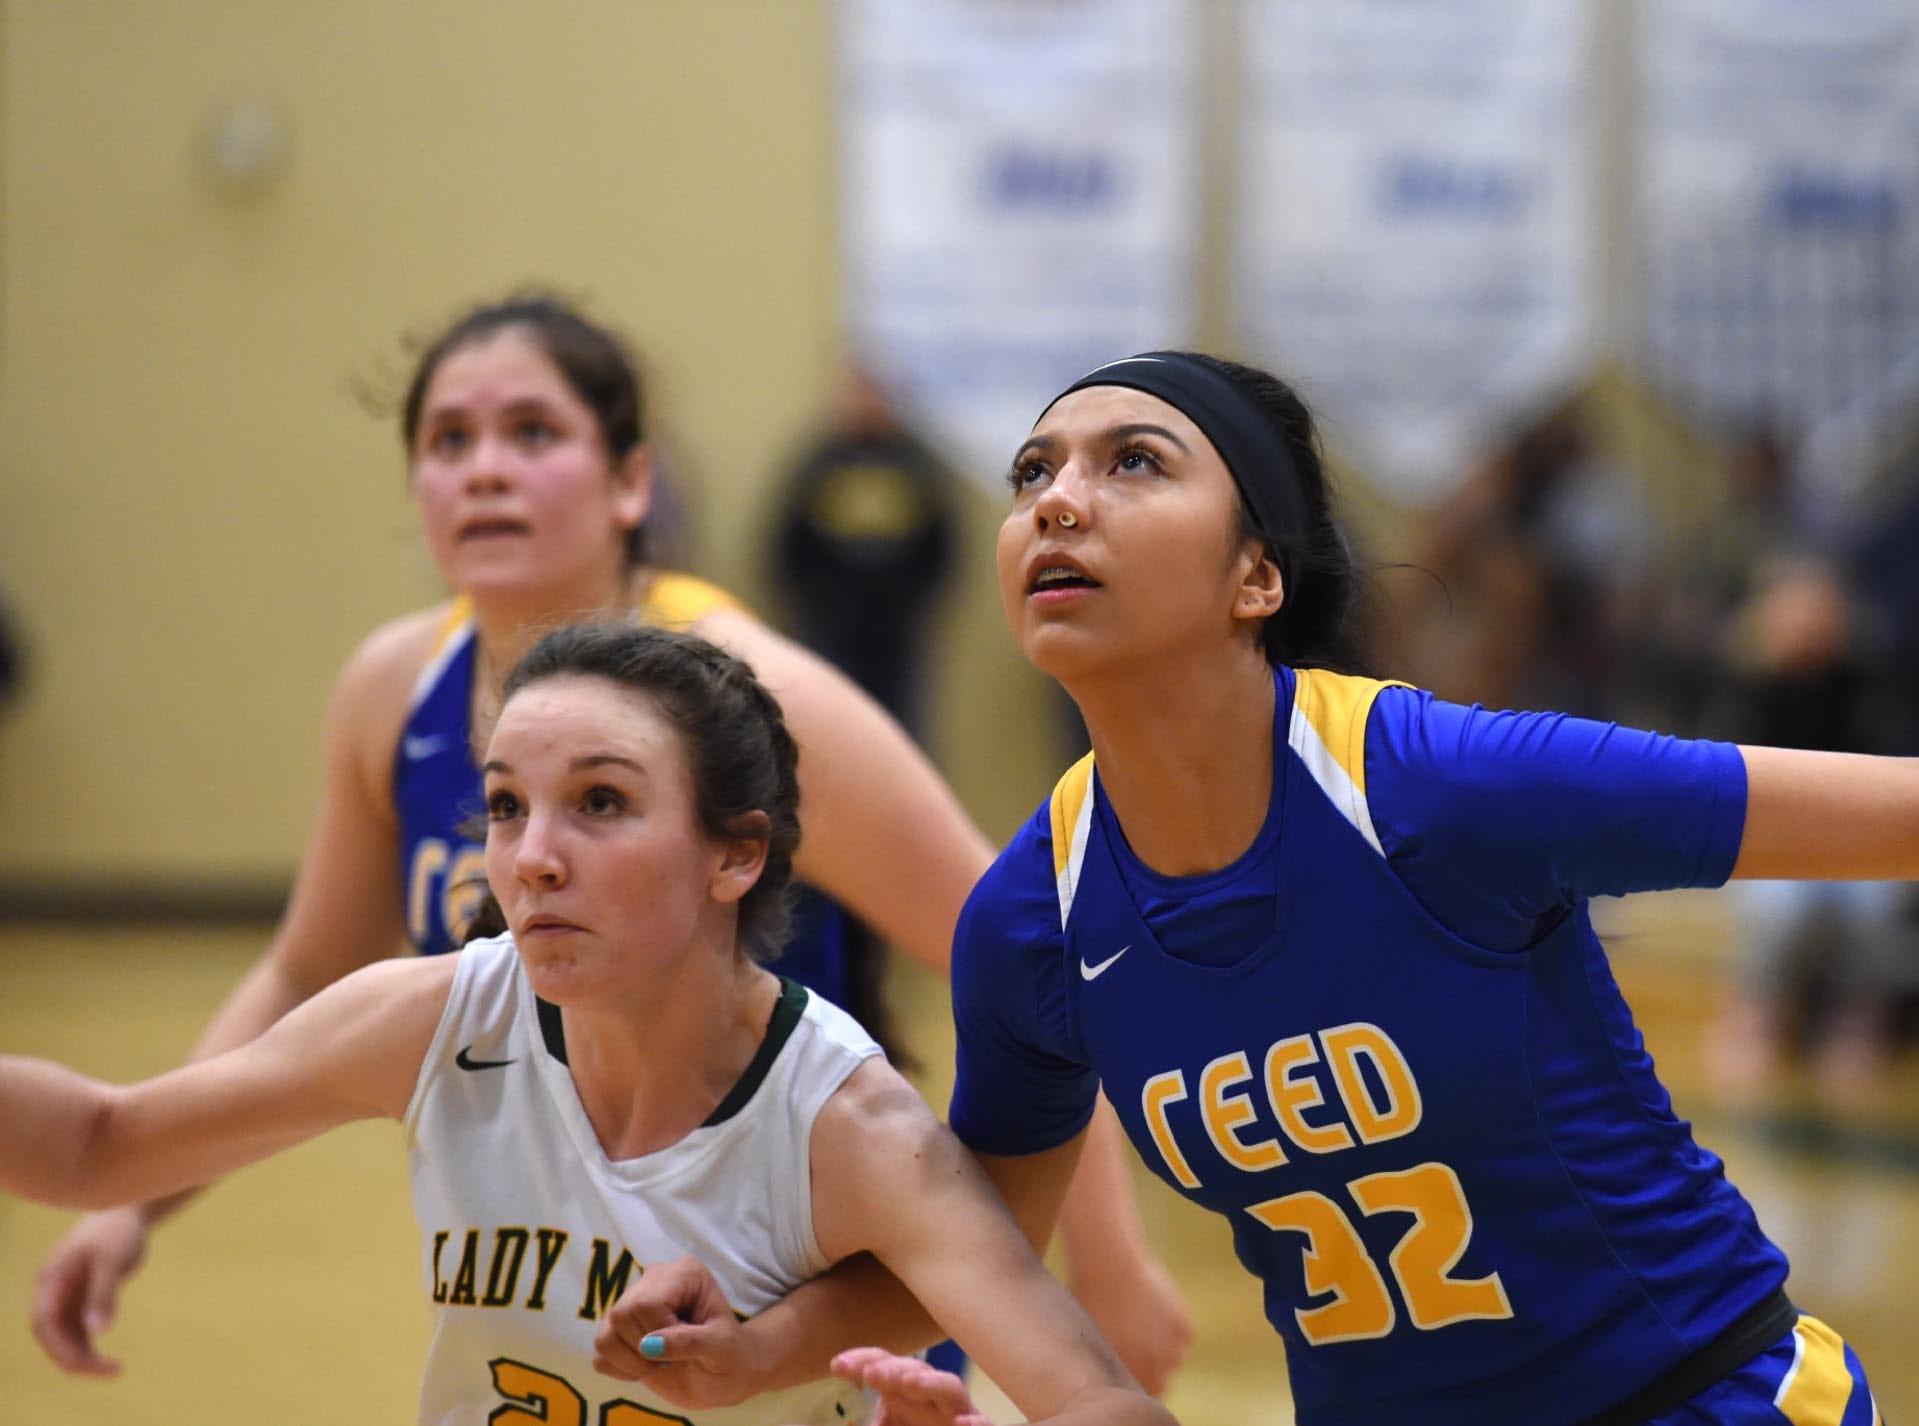 Acton photos of the Reed at Bishop Manogue girls basketball game on Tuesday Jan. 8, 2019.